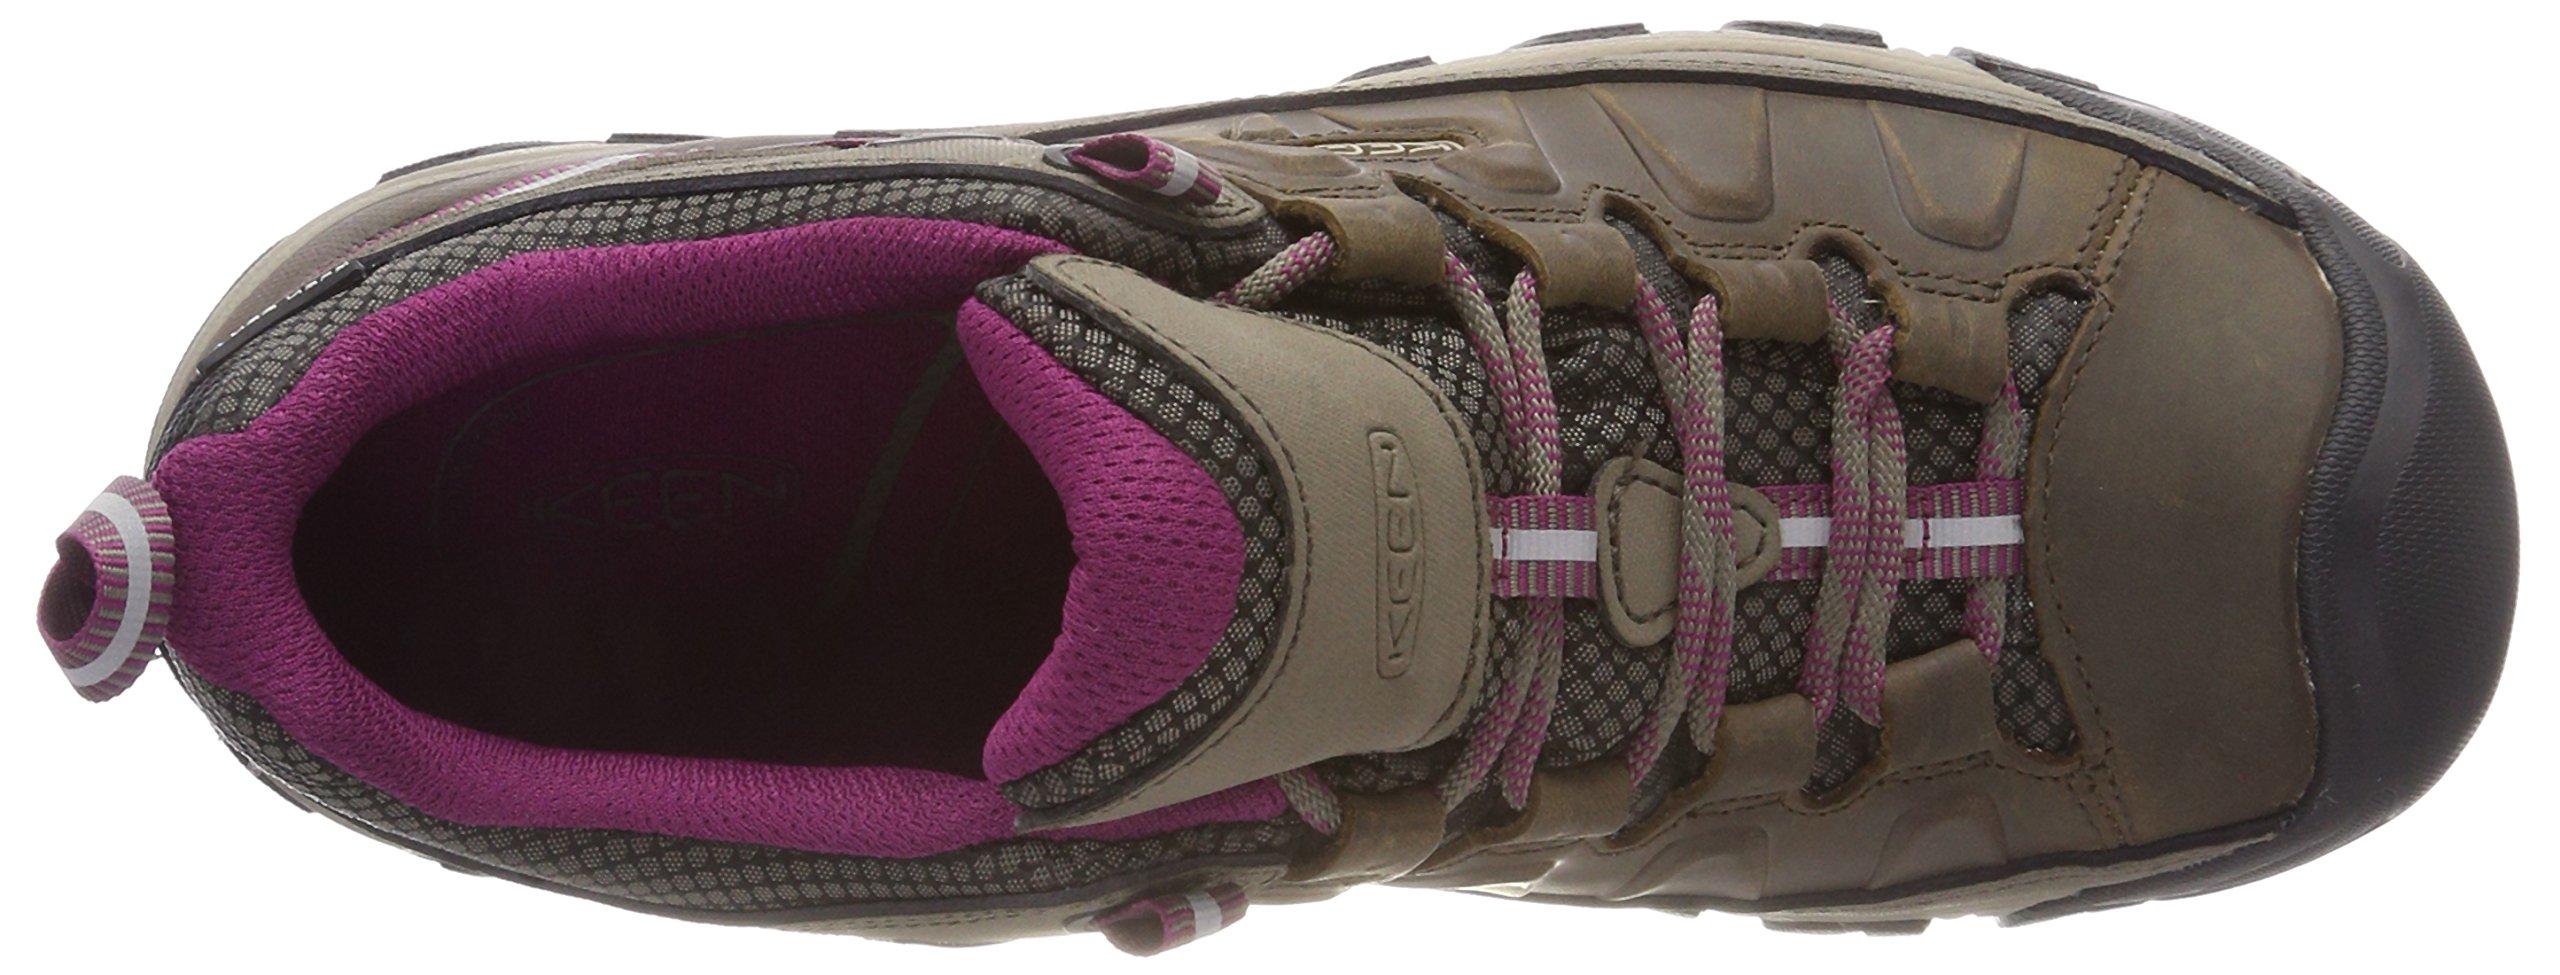 81TfRwAZpIL - KEEN Women's Targhee Iii Wp Low Rise Hiking Shoes, 9